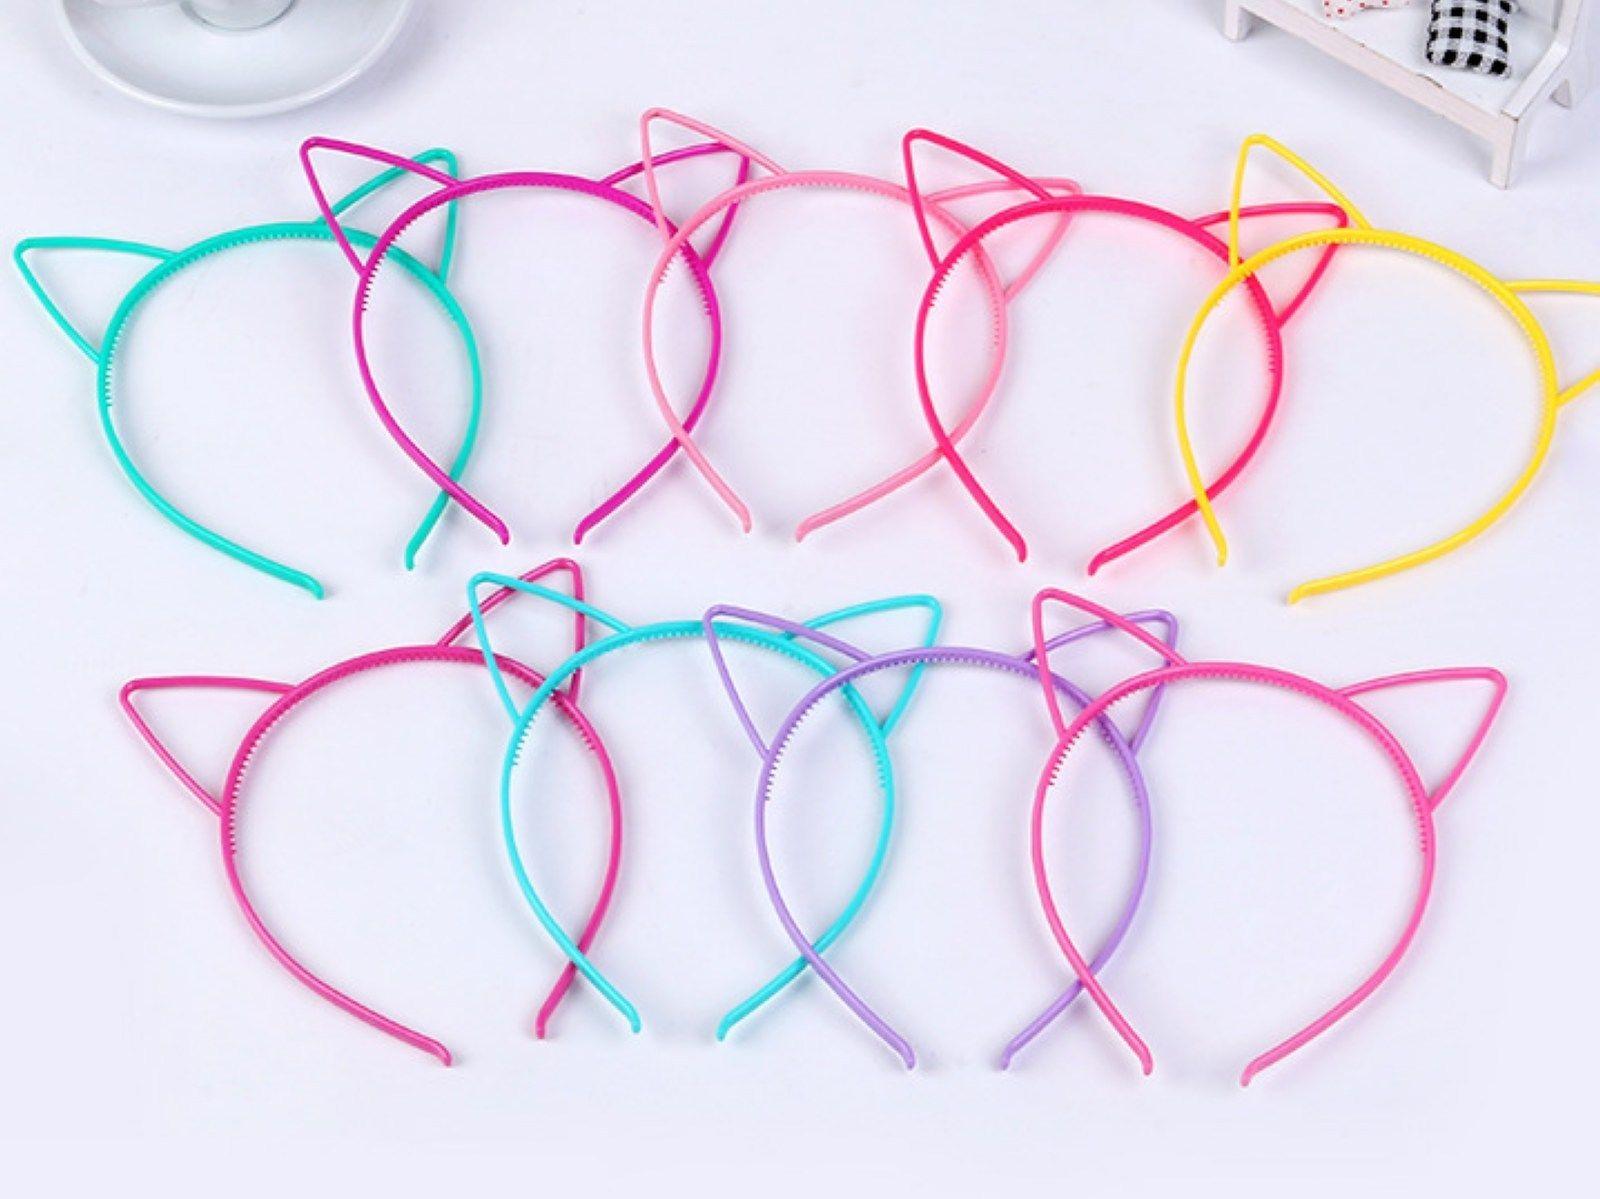 50 Mixed Color Plastic Cat Ear Hair Tiara Princess Headband Hair band With Teeth